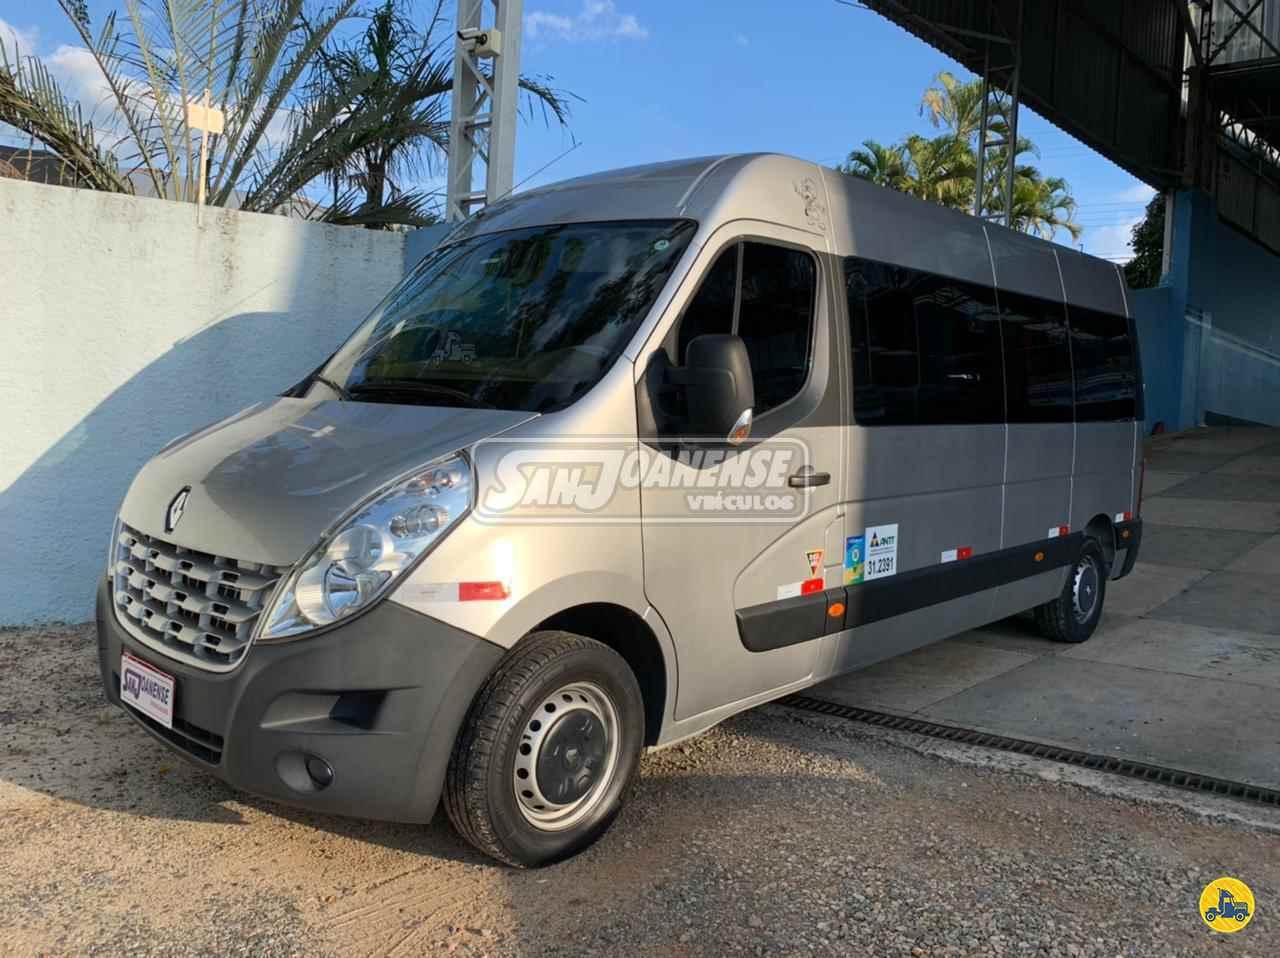 VANS RENAULT Master Executiva 2.3 Sanjoanense Veículos SAO JOAO DA BOA VISTA SÃO PAULO SP